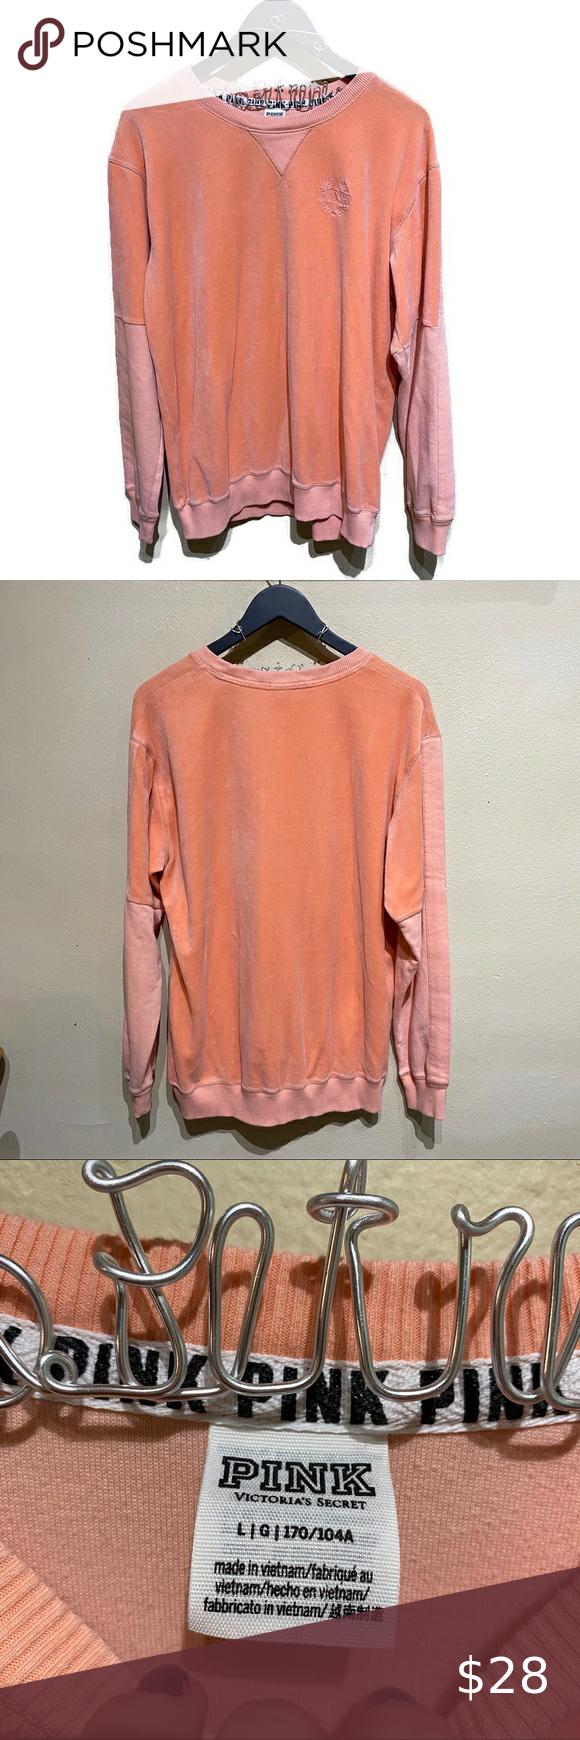 Vs Pink Peach Velvet Velour Crewneck Sweatshirt Victoria Secret Pink Peach Velvet Velour Crewneck Sweatshir Crew Neck Sweatshirt Sweatshirts Oversized Pullover [ 1740 x 580 Pixel ]